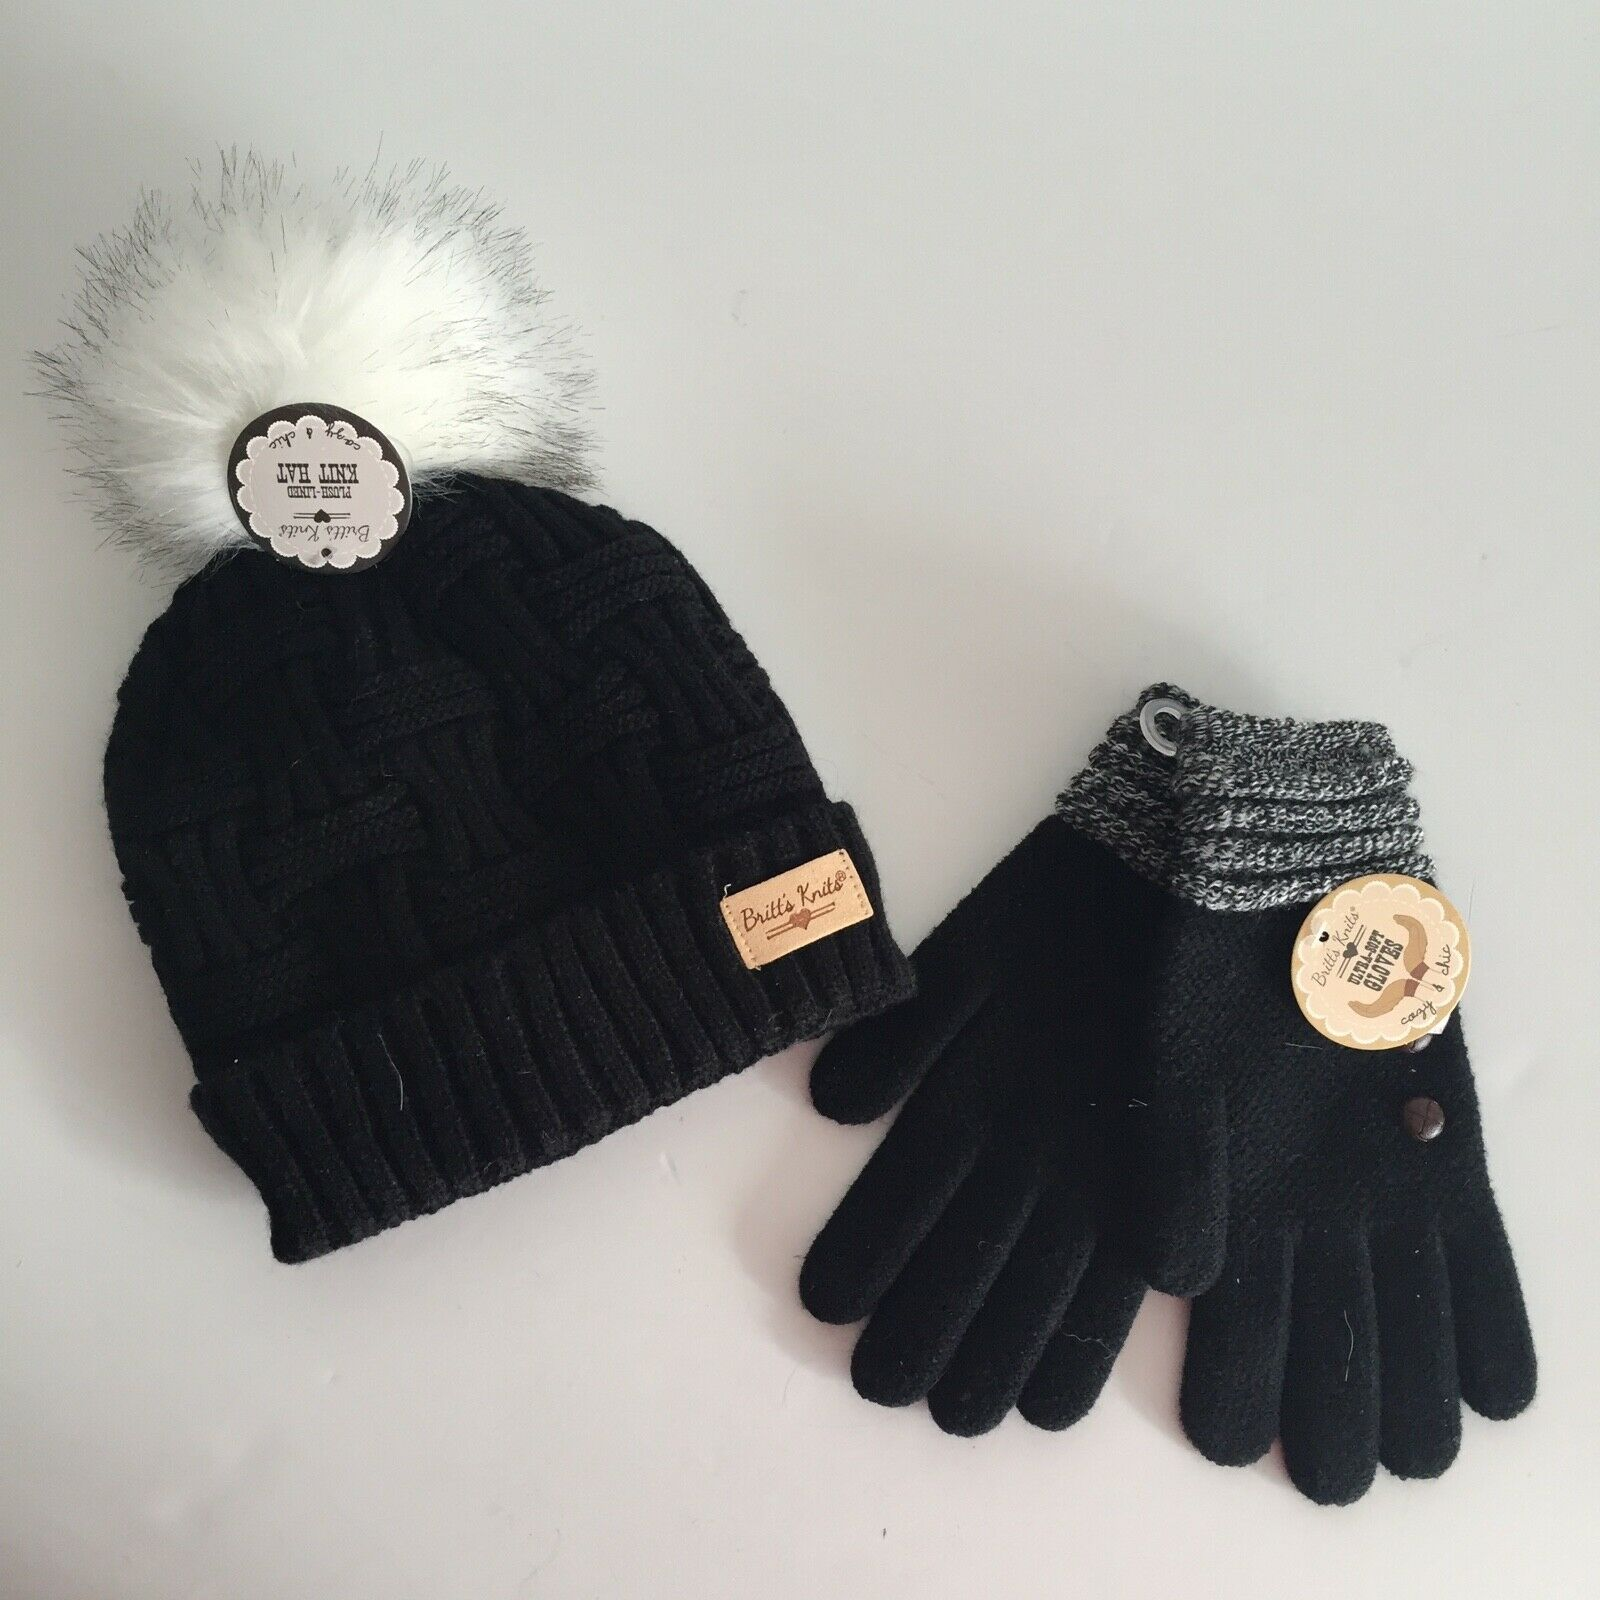 Britt's Knits Women's Hat and Glove Set Acrylic Pom Pom Plush Lined One Size NWT